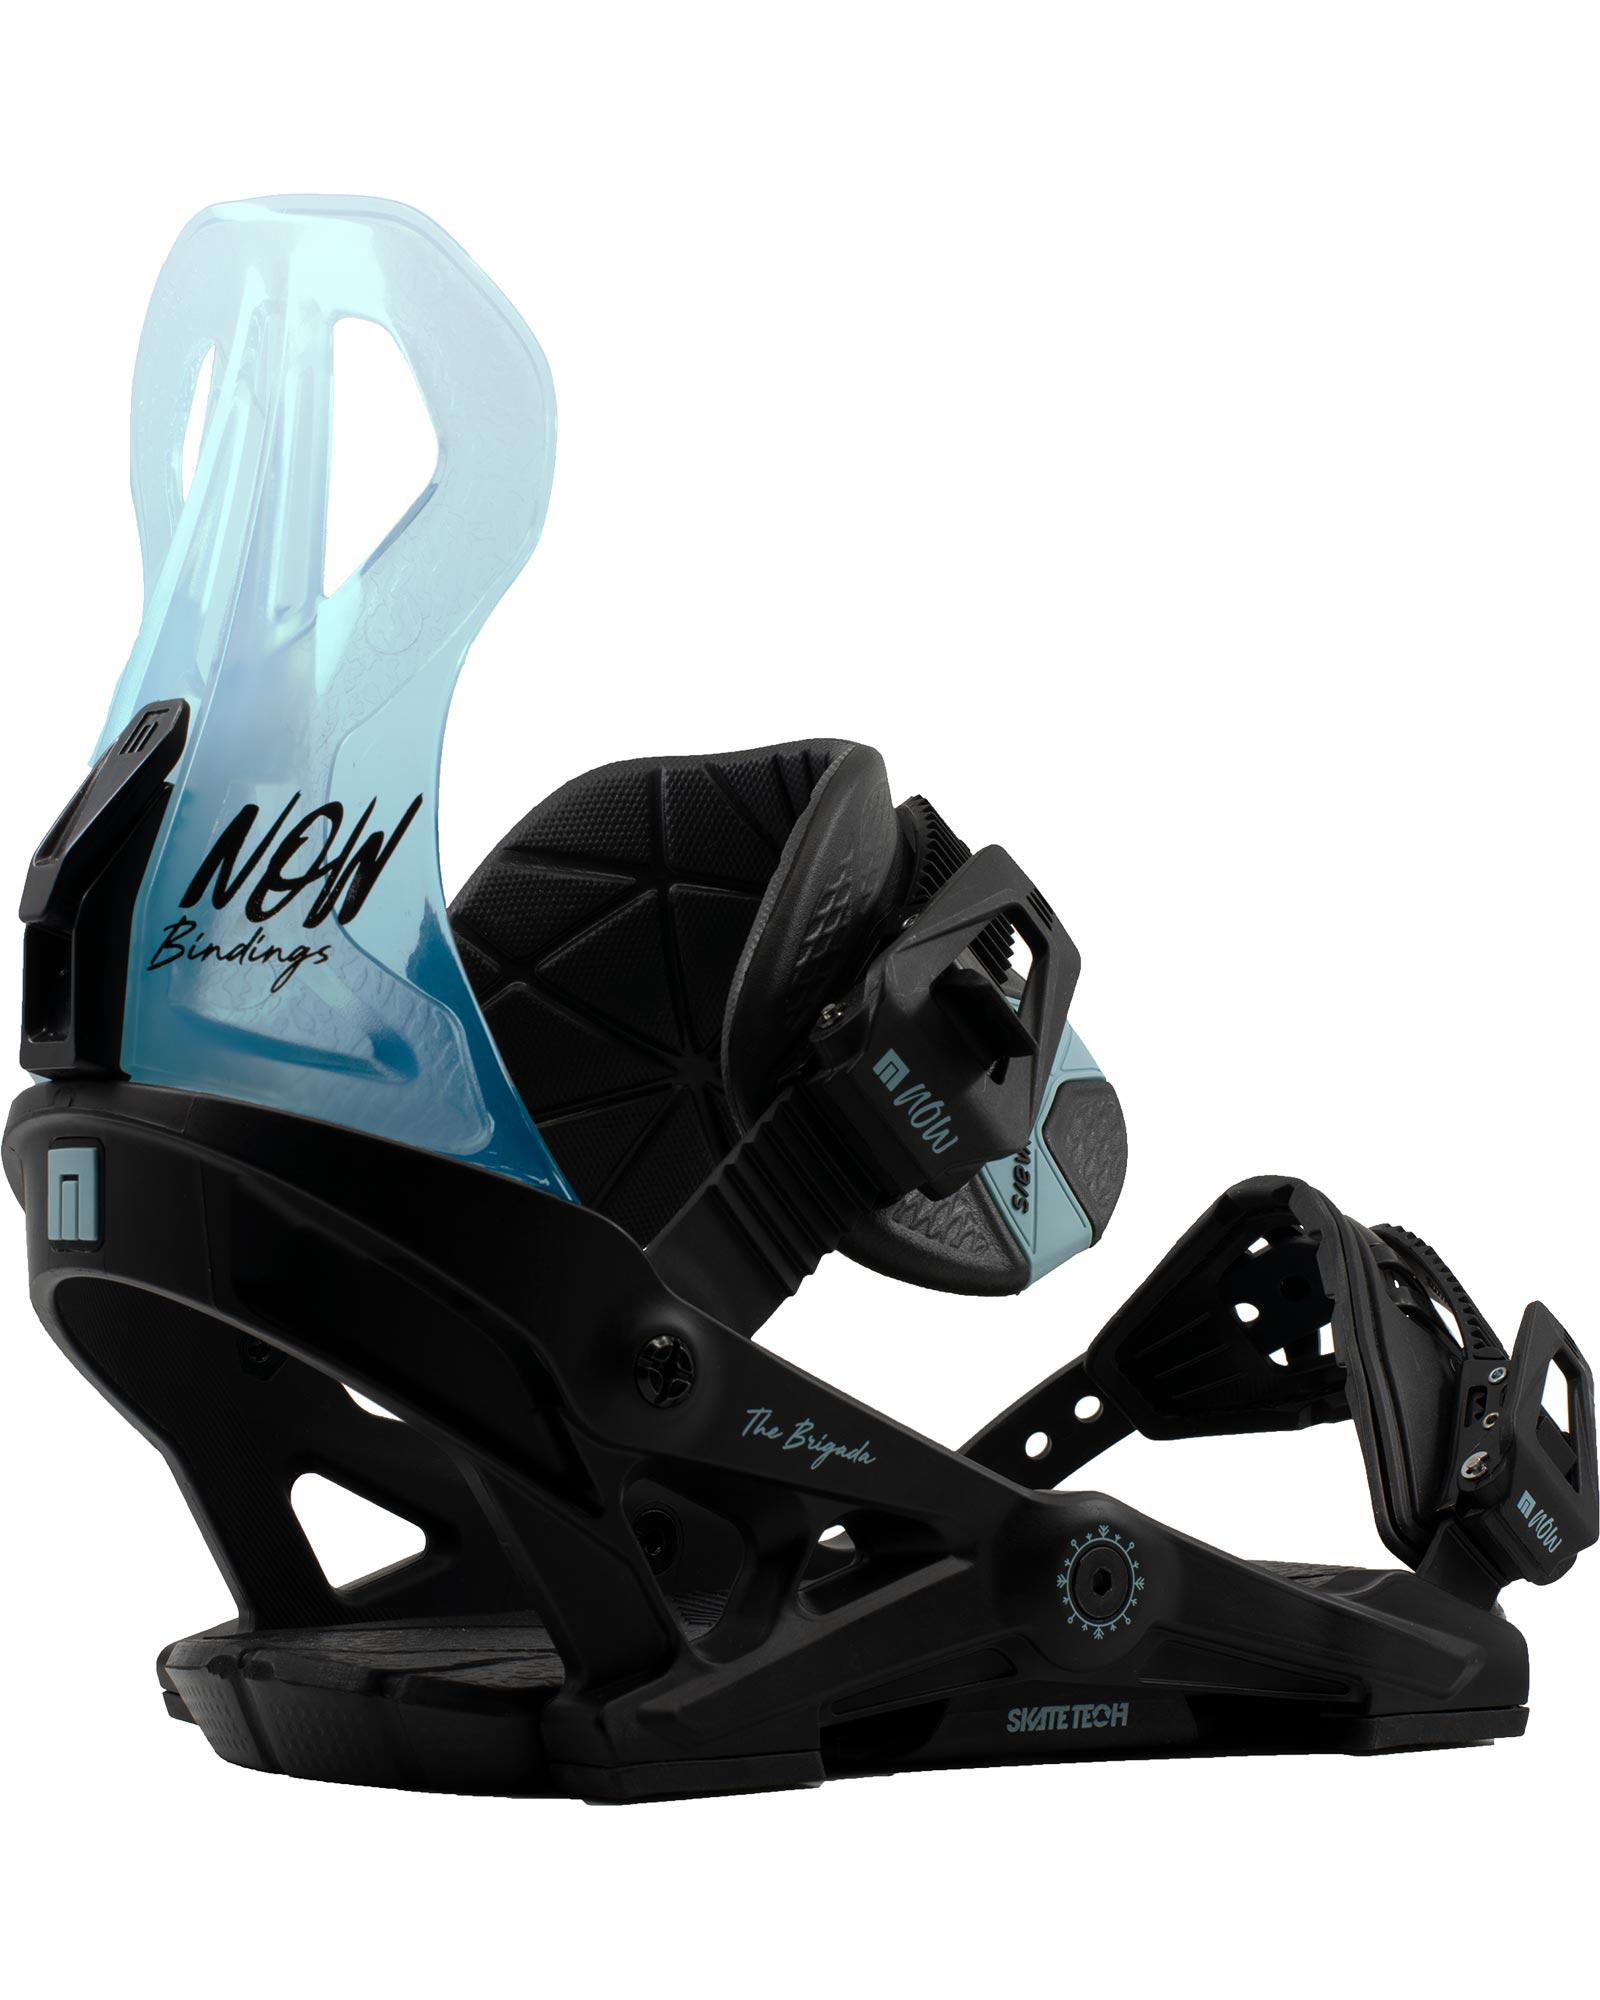 NOW Brigada Women's Snowboard Bindings 2021 0